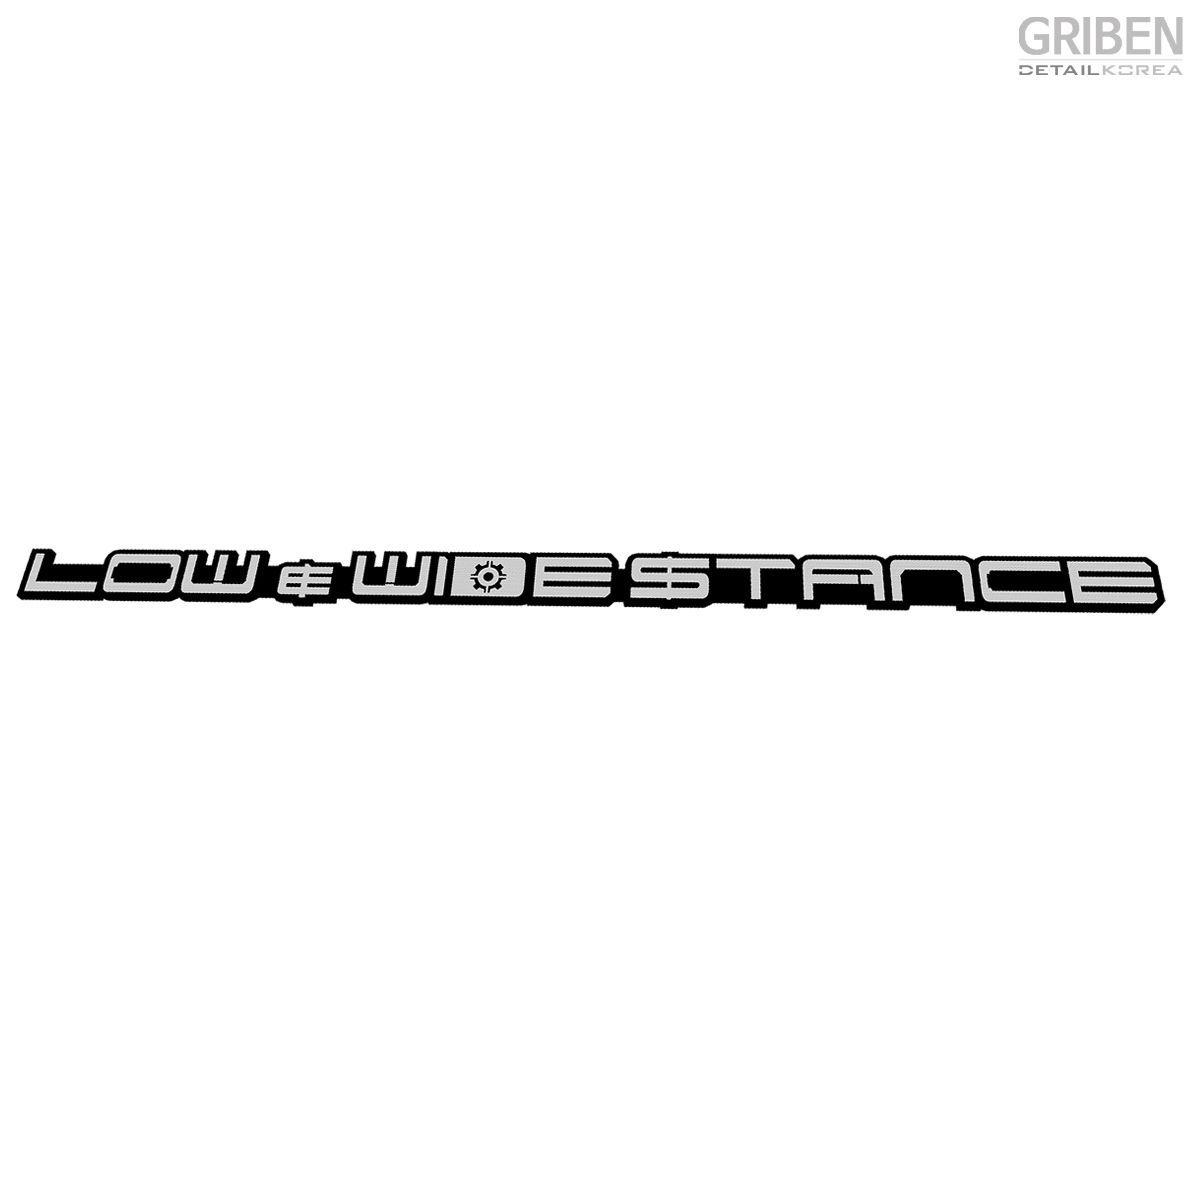 Griben Car Slogan Emblem Badge Silver 30198 for Hyundai Kona